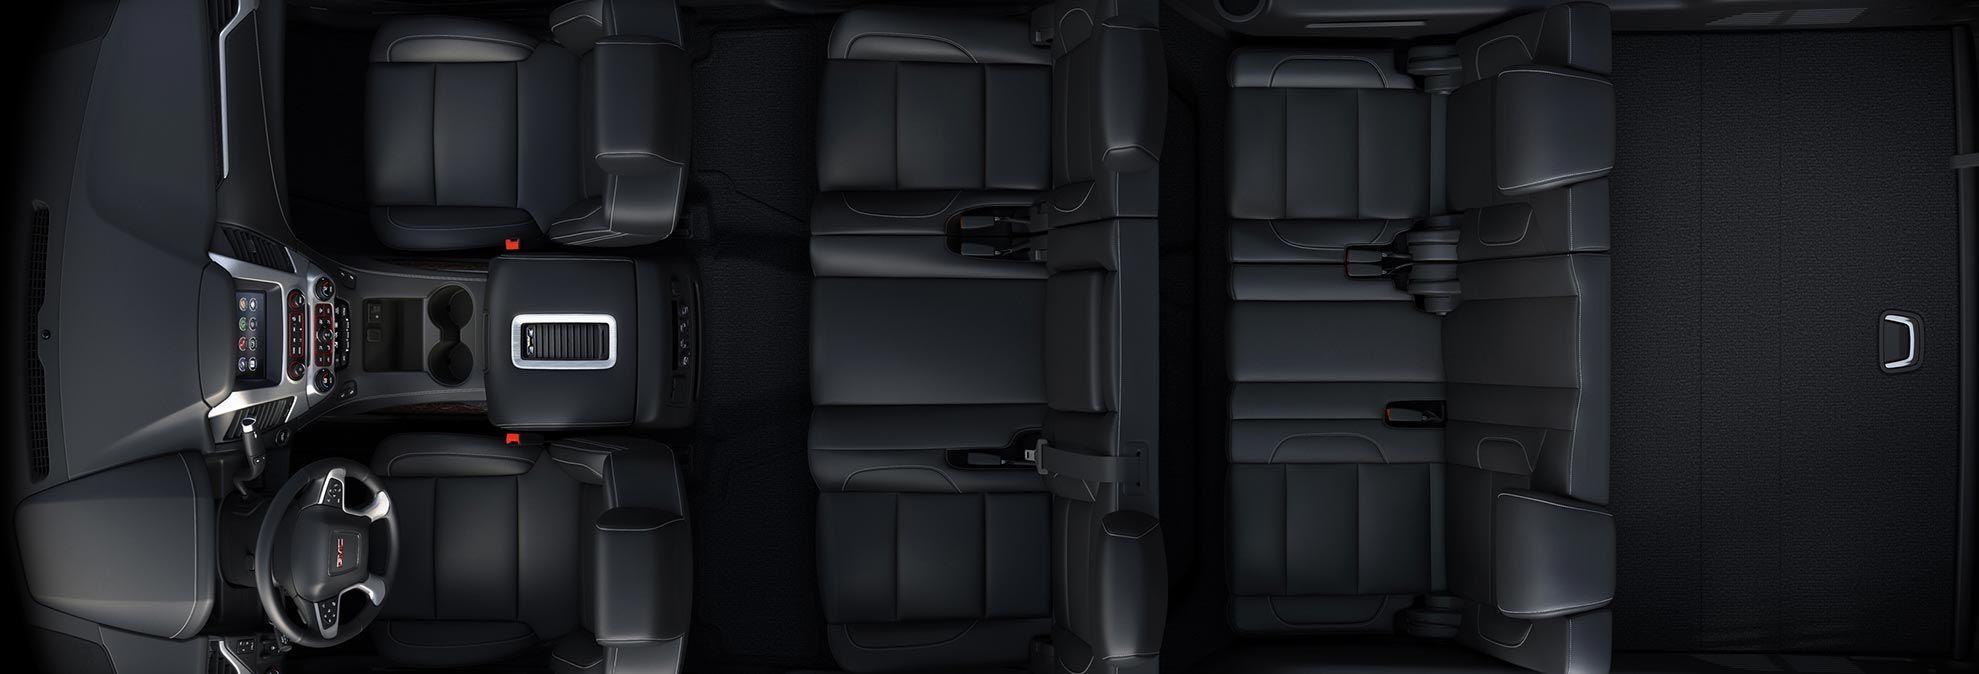 Suvs And Minivans With The Best Third Row Seats Gmc Yukon Xl